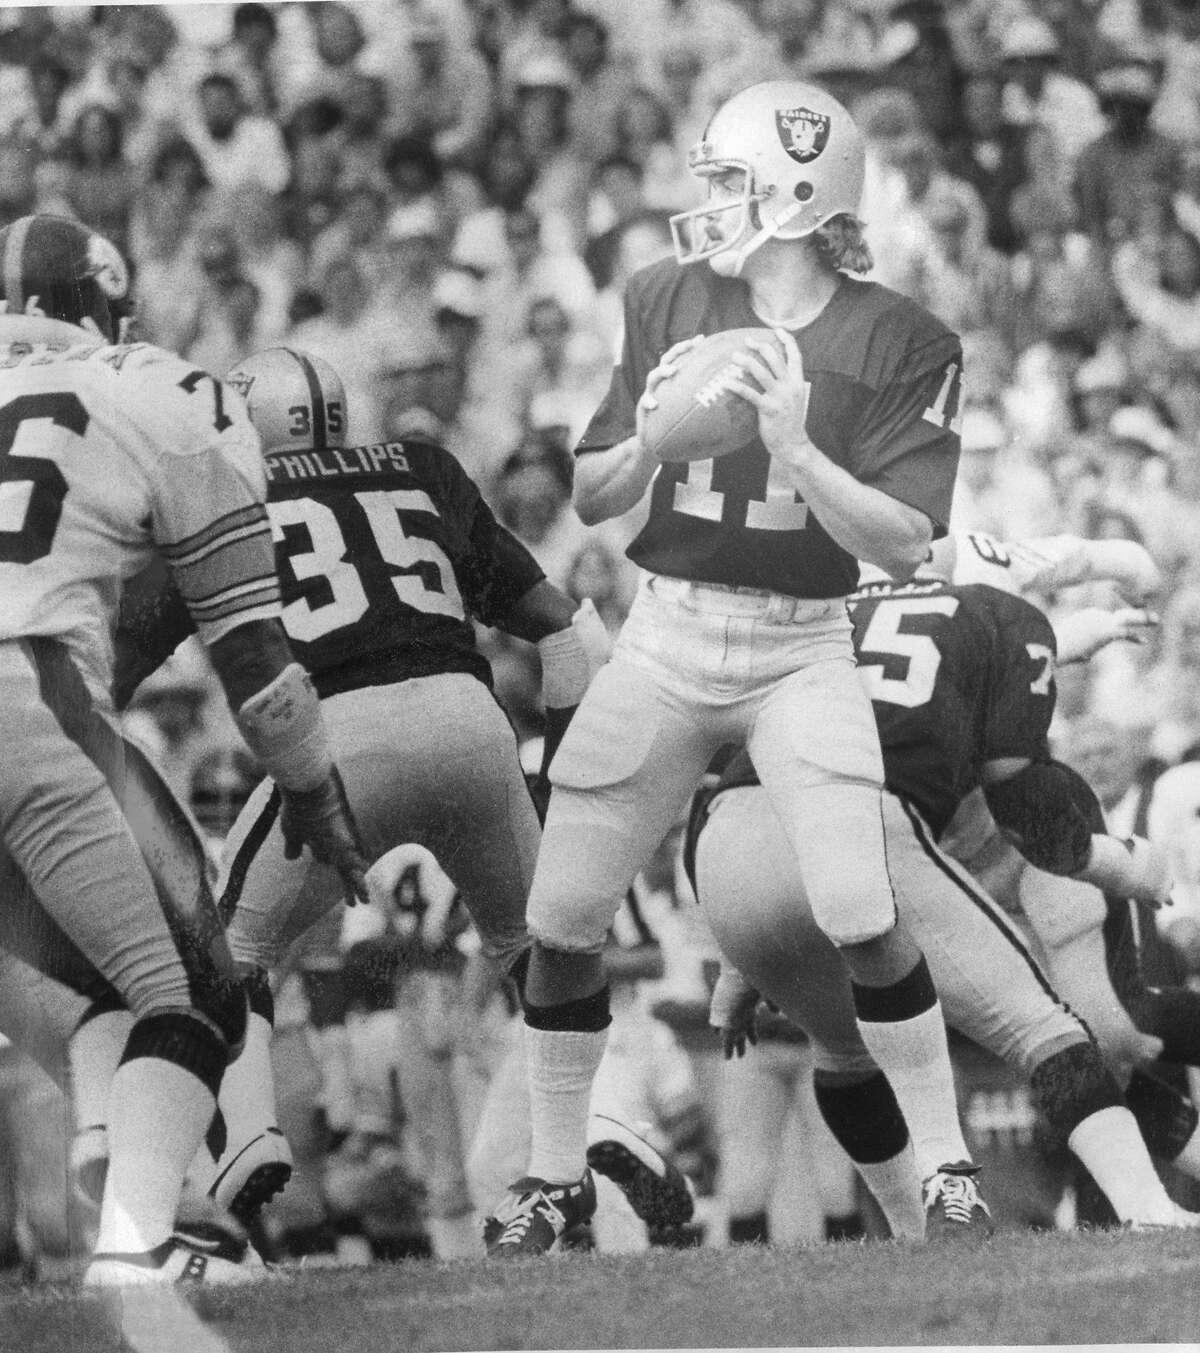 David Humm backup quarterback for the Oakland Raiders, Photo ran 08/18/1975, p. 43